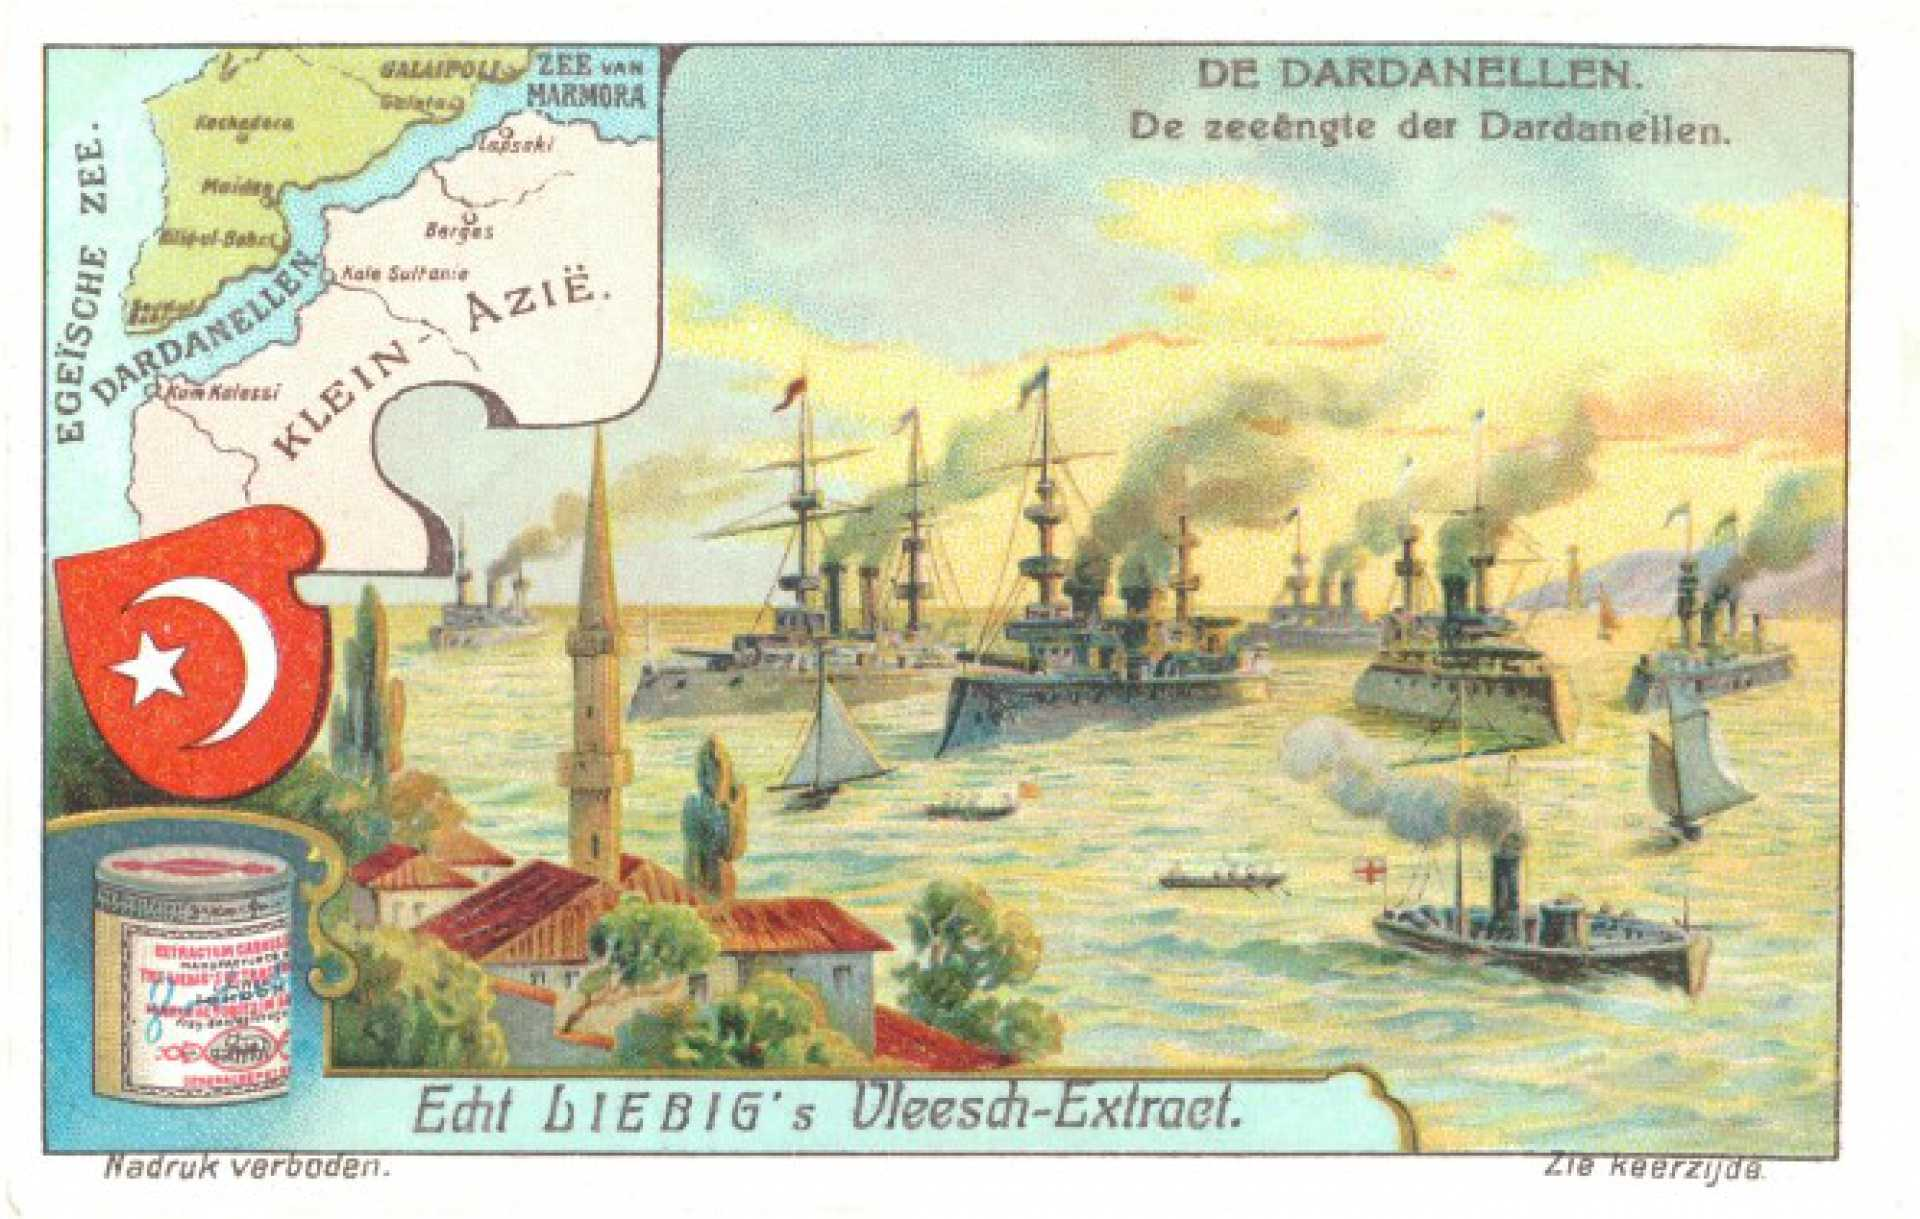 De zeeengte der Dardanellen